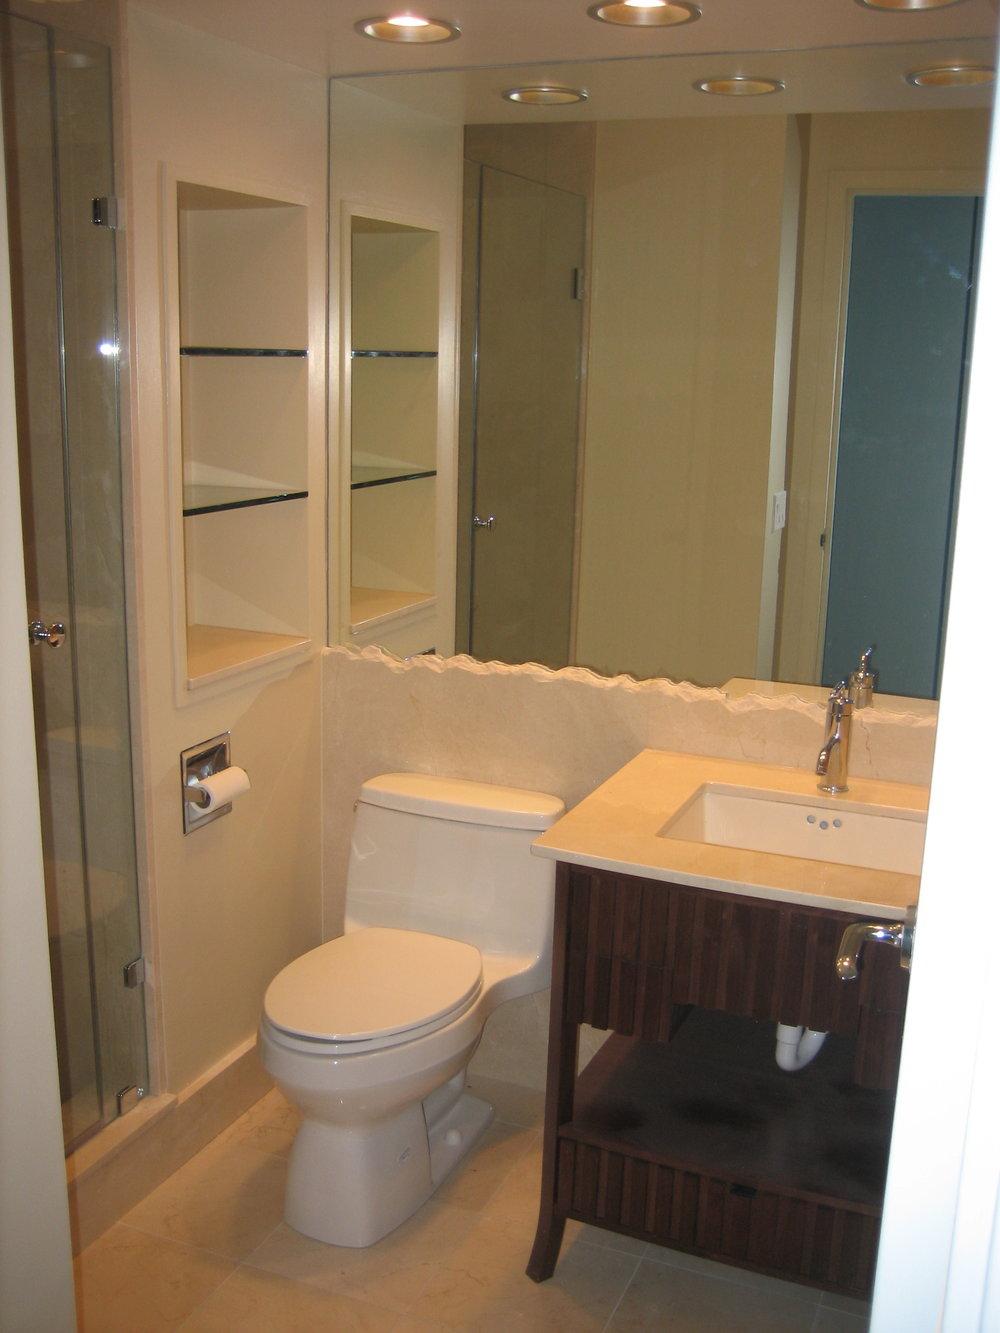 Bathroom - Chicago 1 copy.JPG